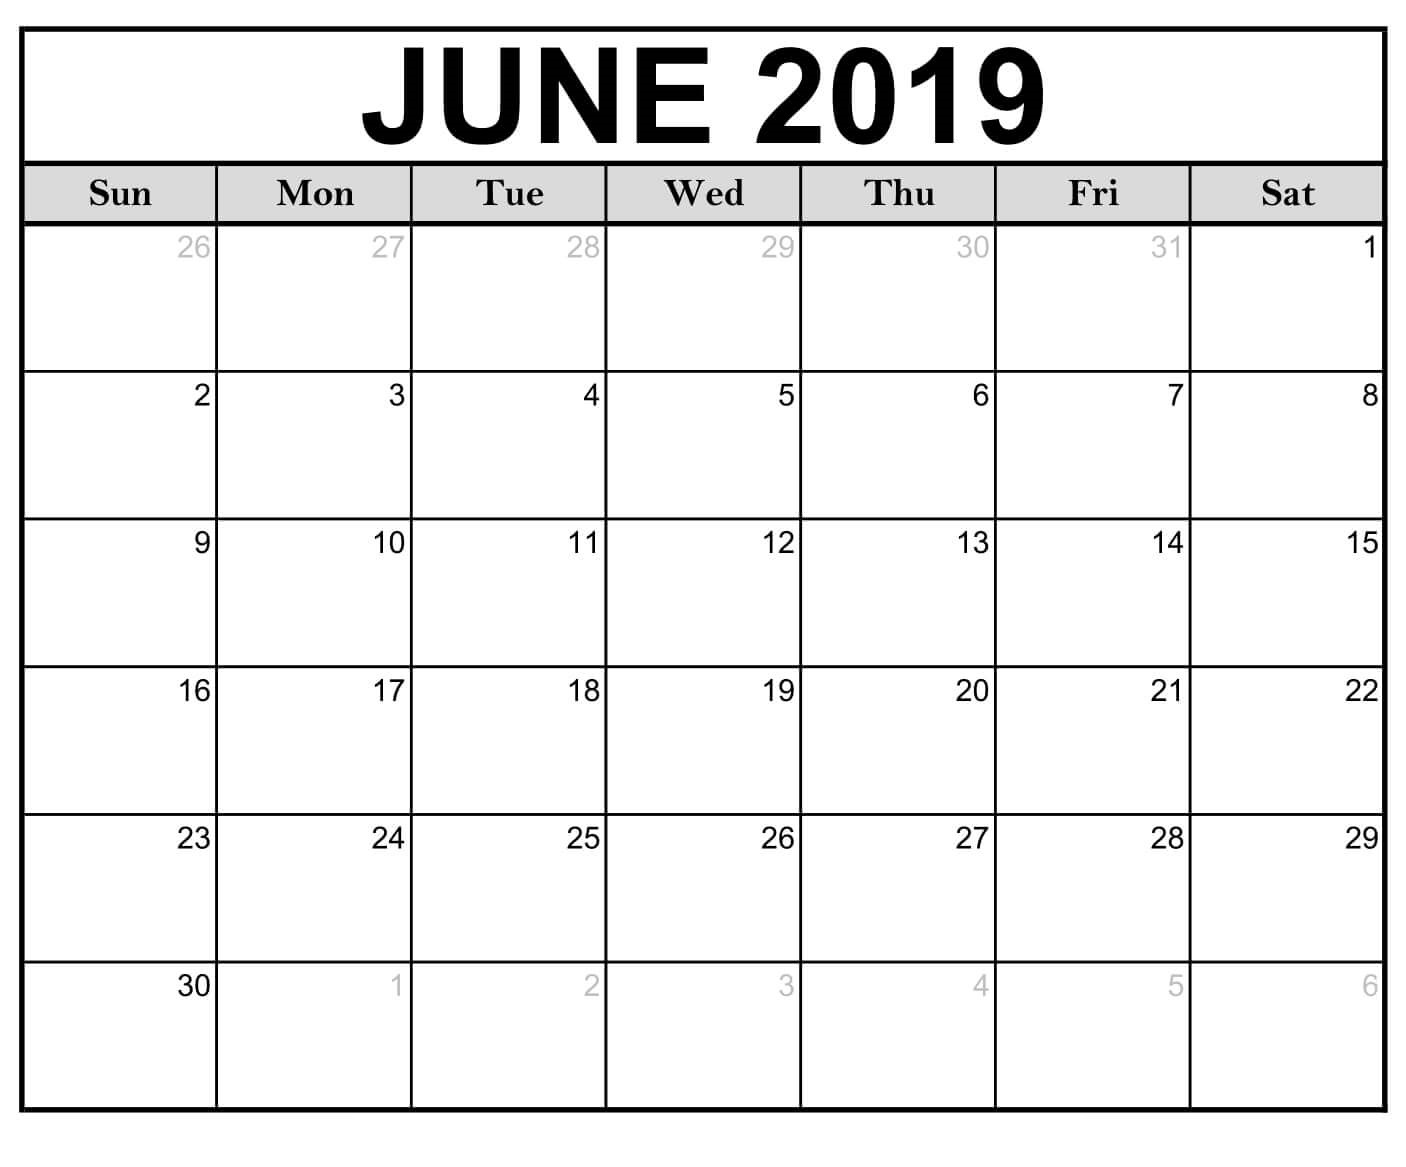 June Calendar Template 2019